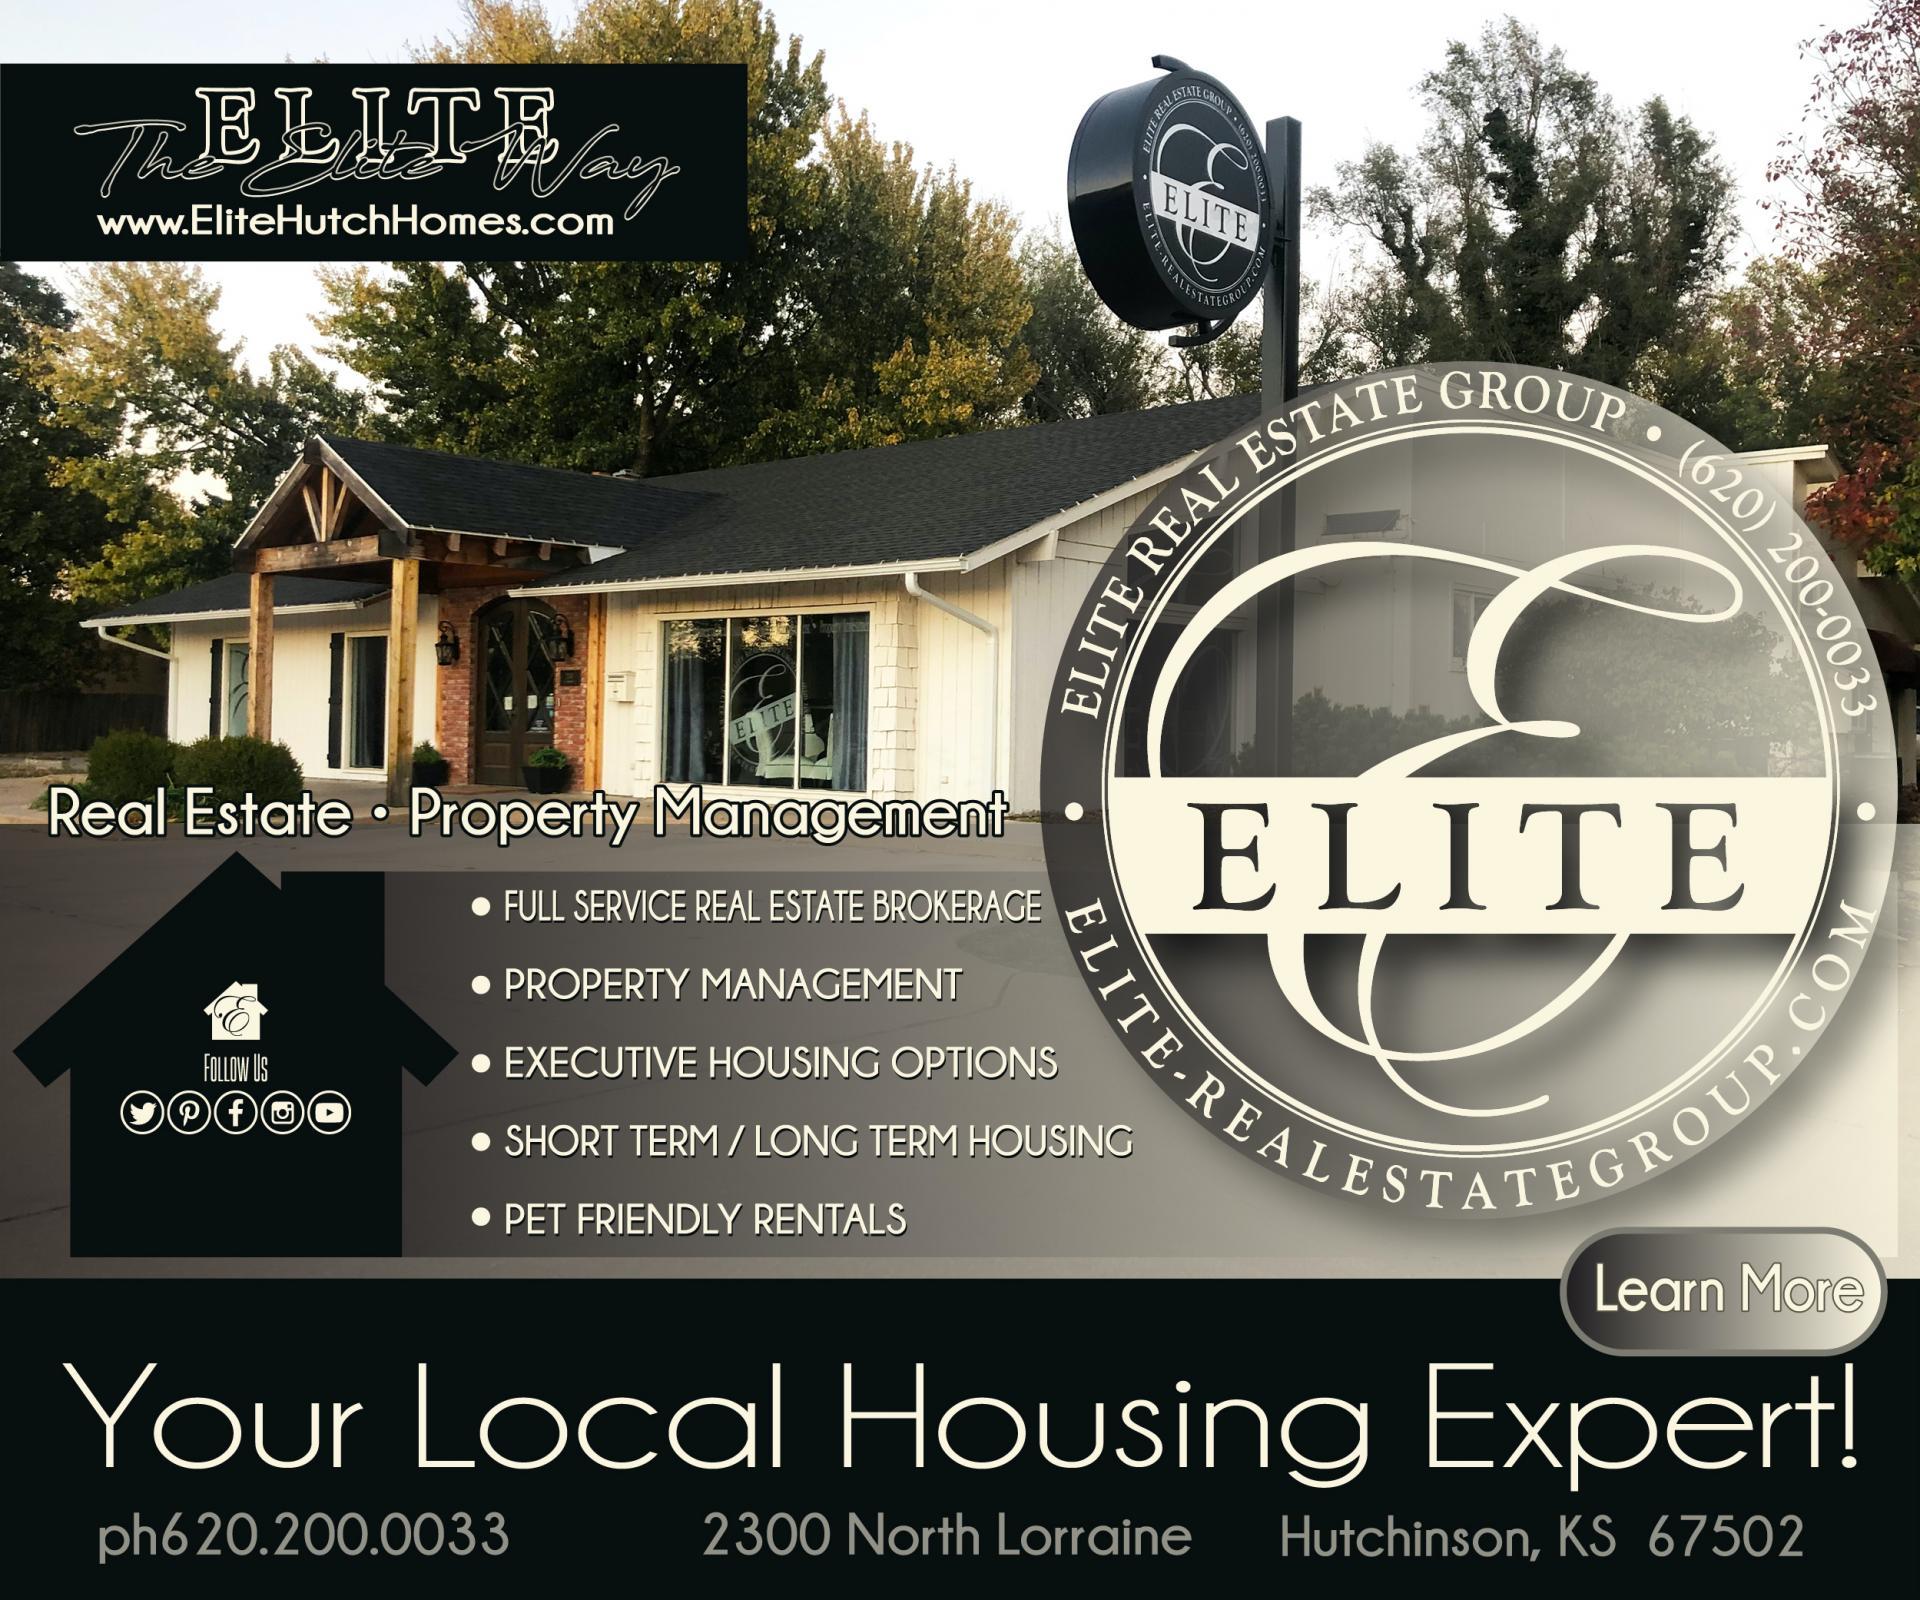 Elite-Real-Estate_ad